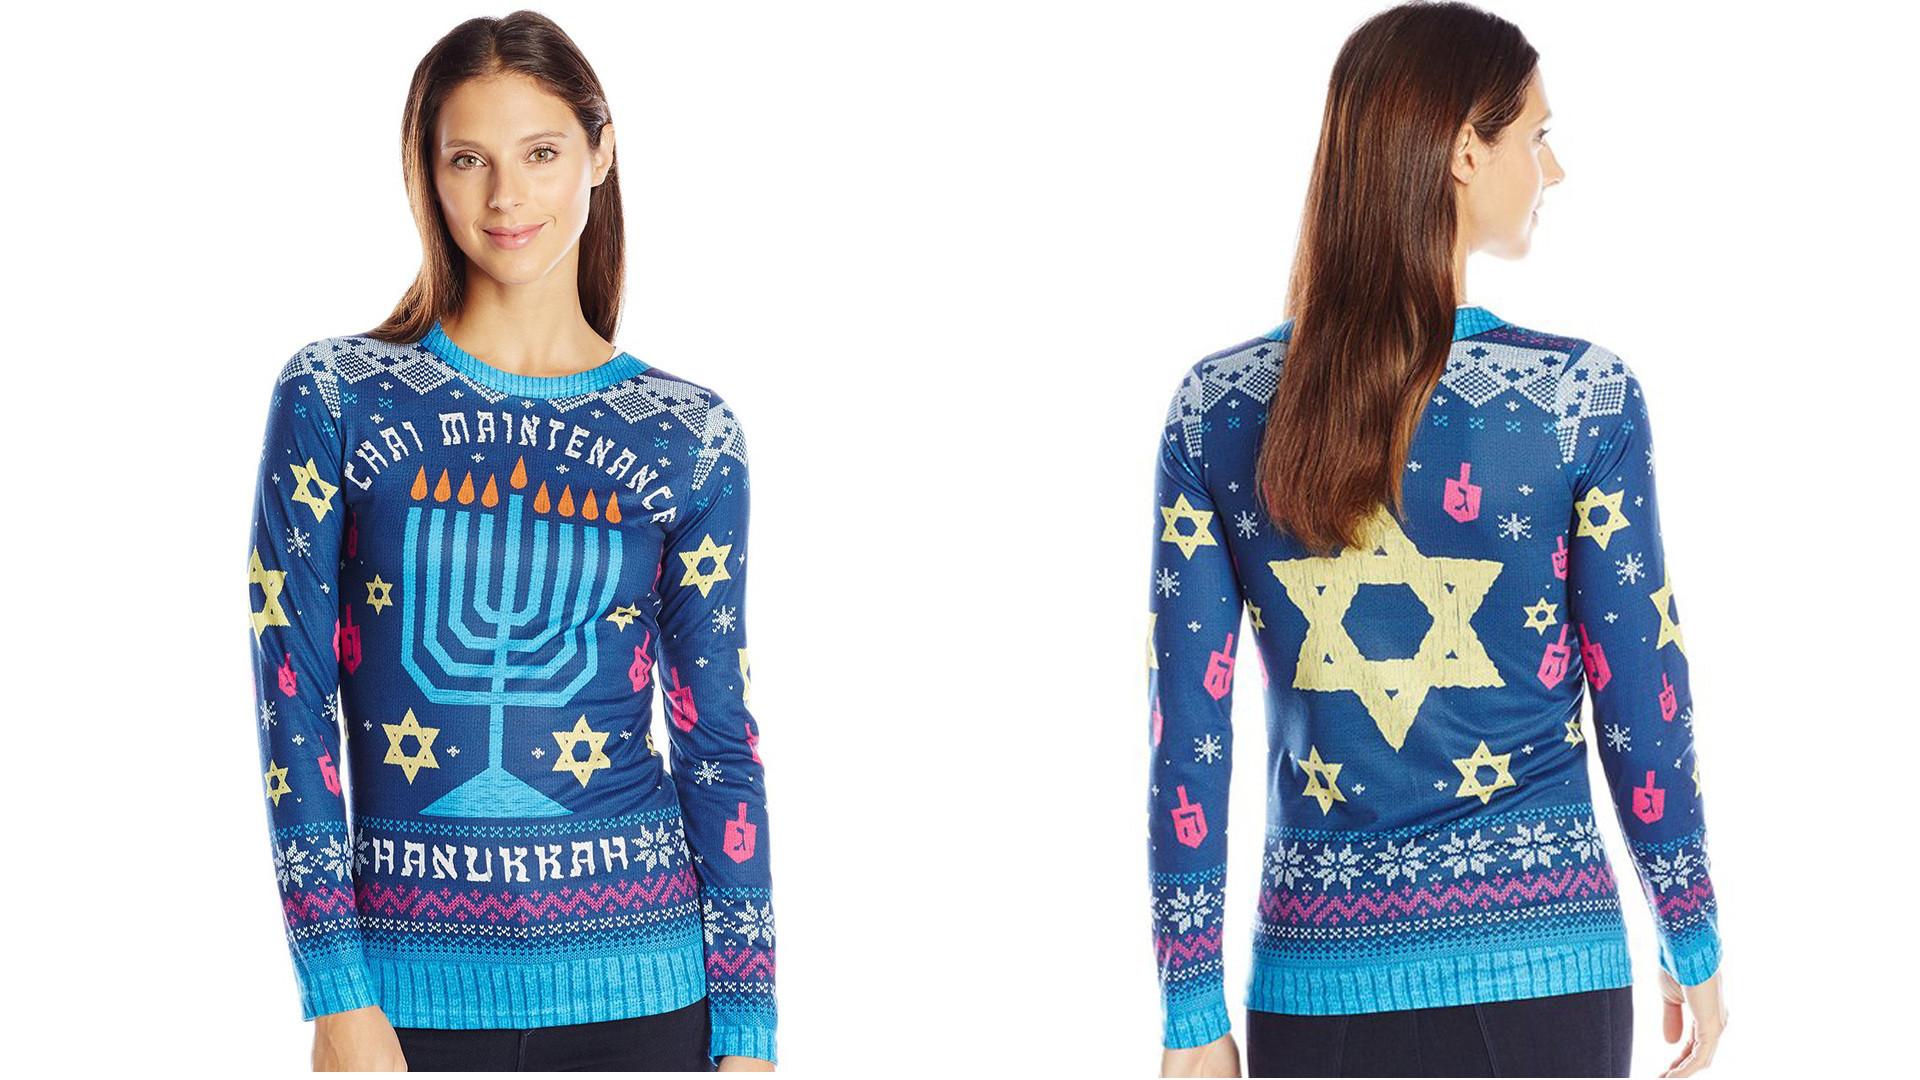 Nordstrom pulls controversial Hanukkah sweater after Facebook firestorm